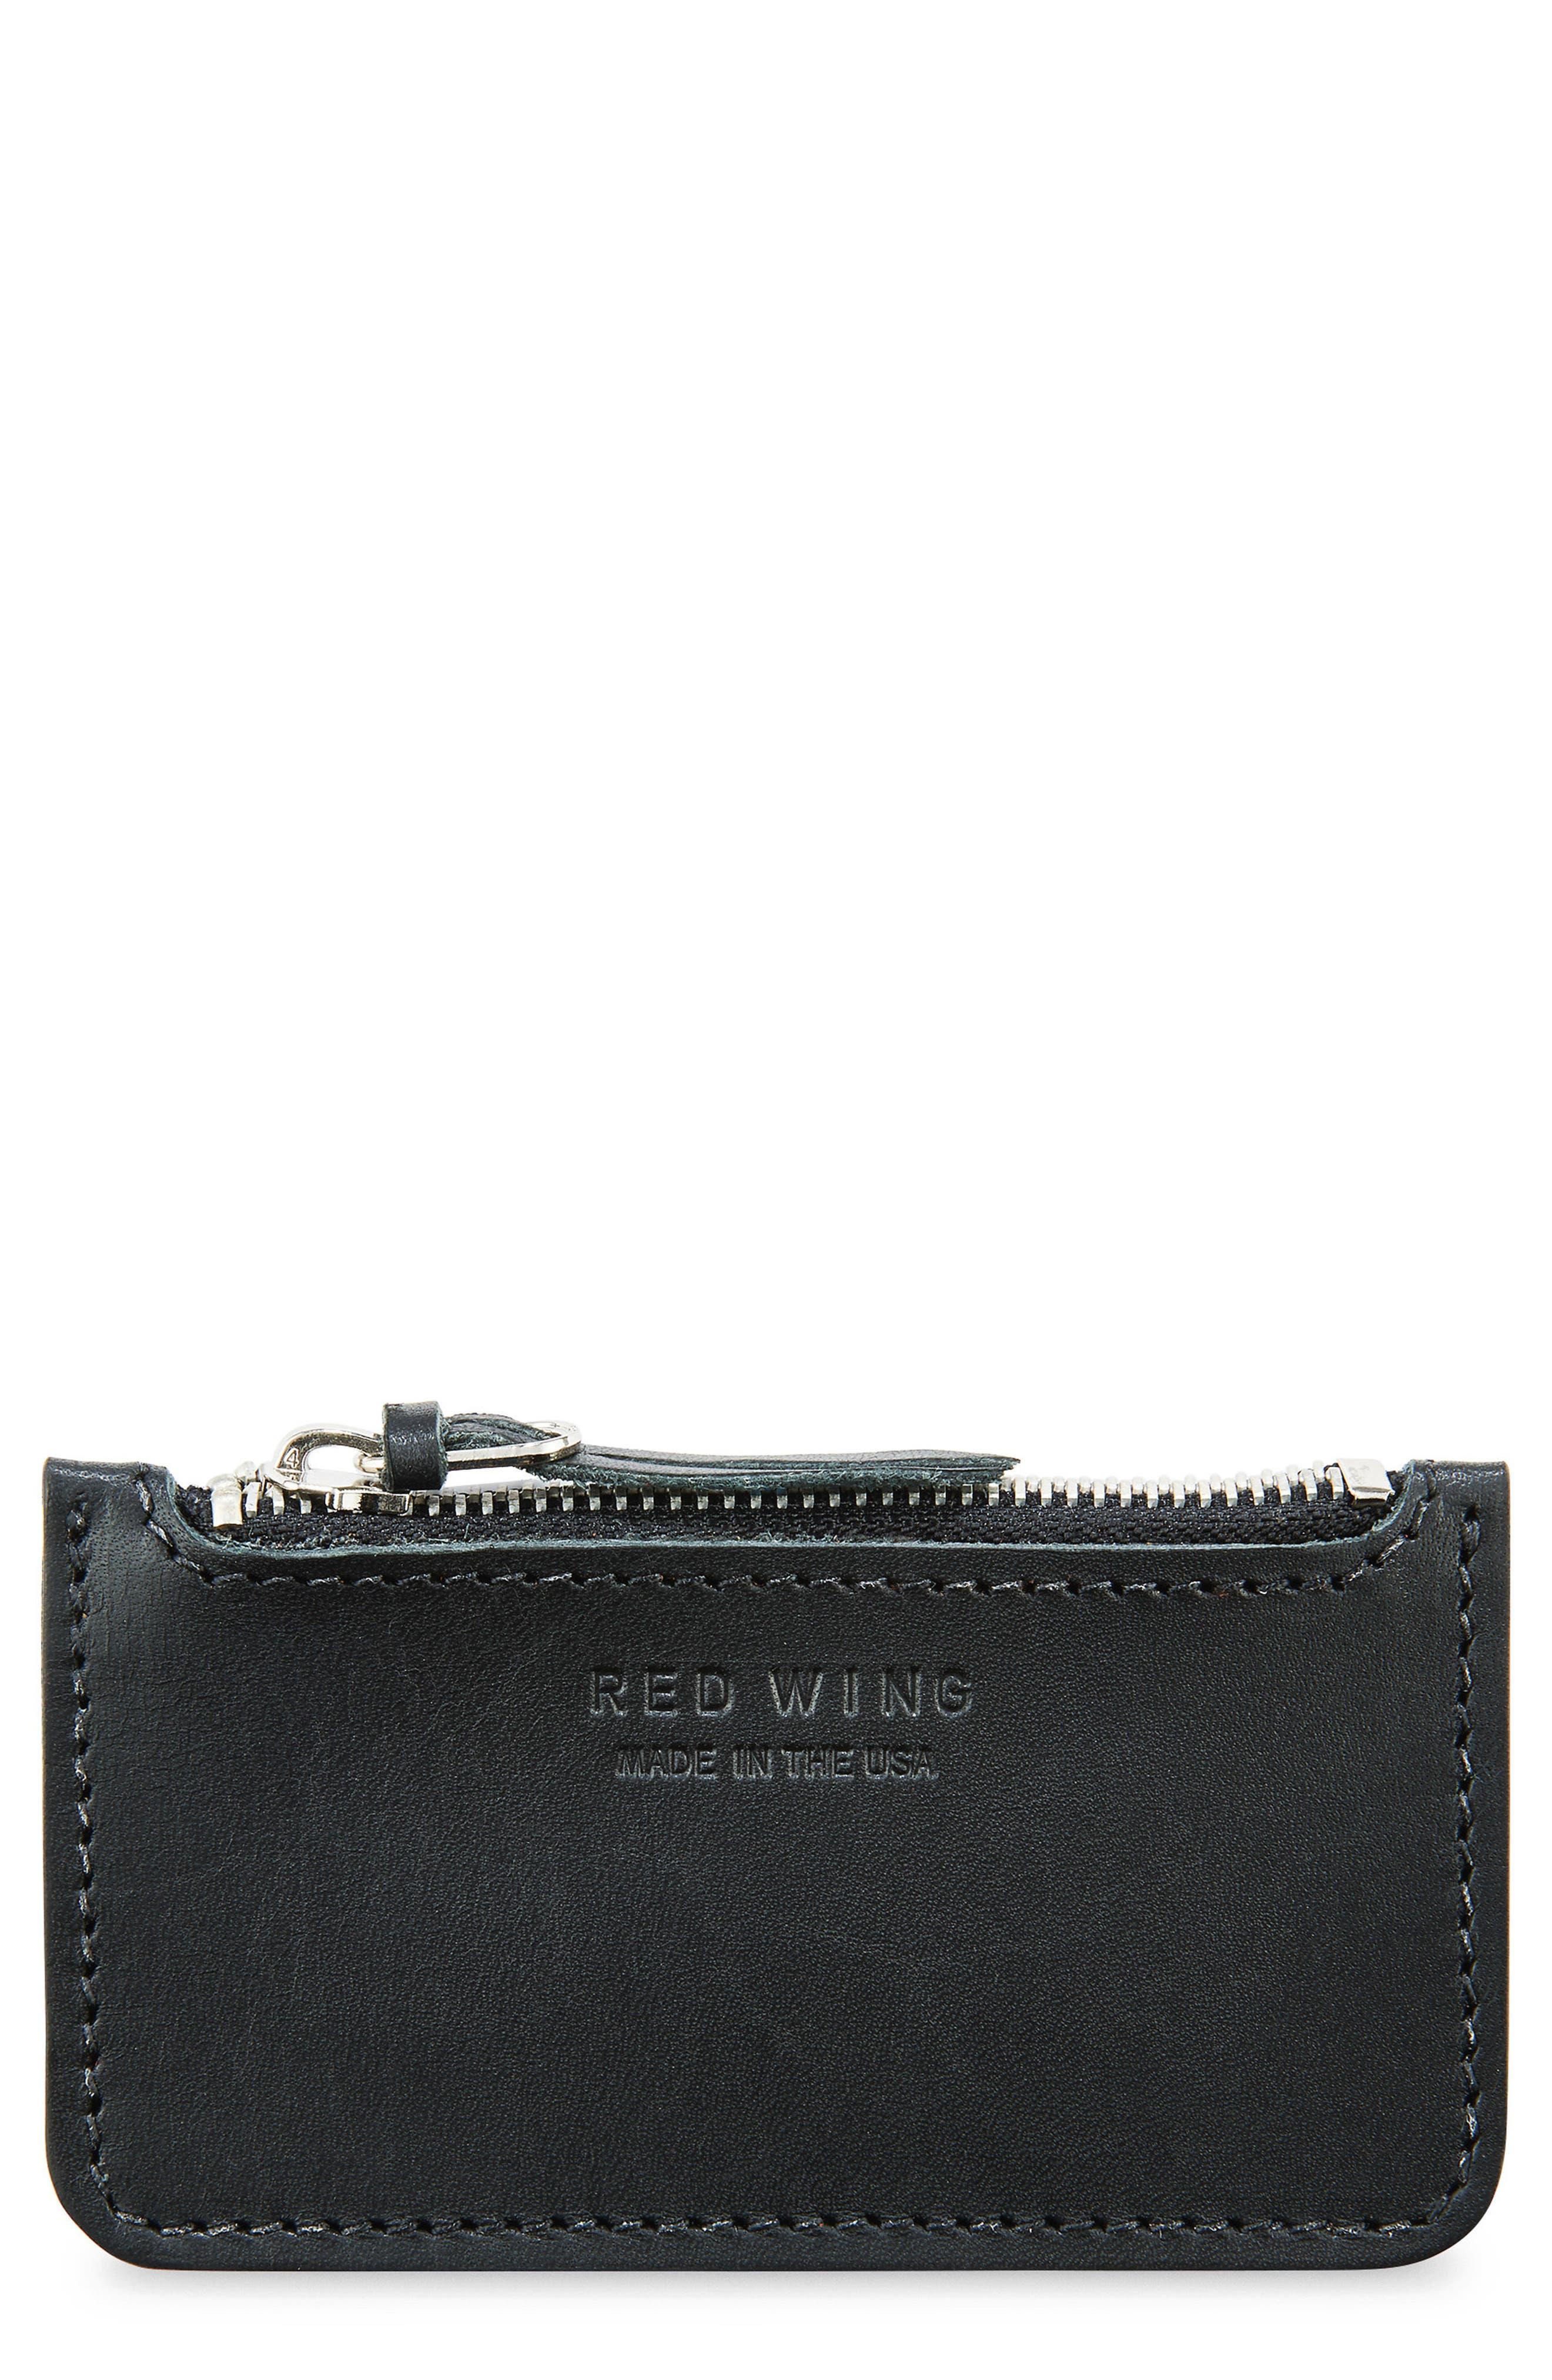 Once Leather Zipper Pouch,                             Main thumbnail 1, color,                             Black